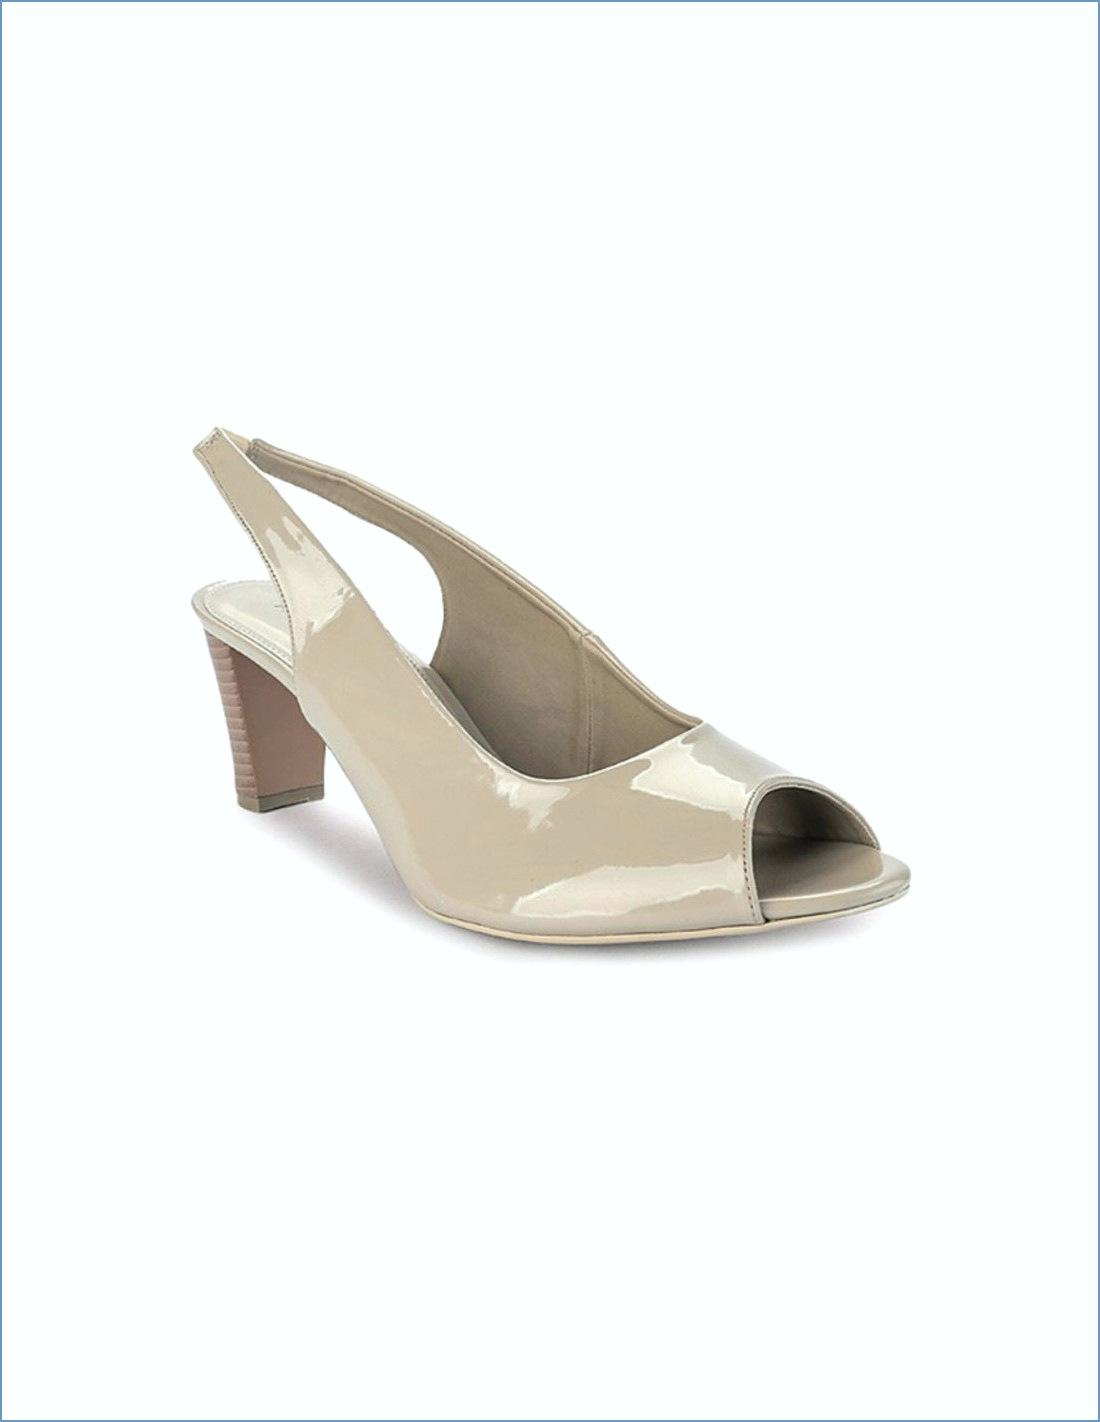 1409 marelli high heels wanita 7109 terkait Sepatu High Heels Wanita